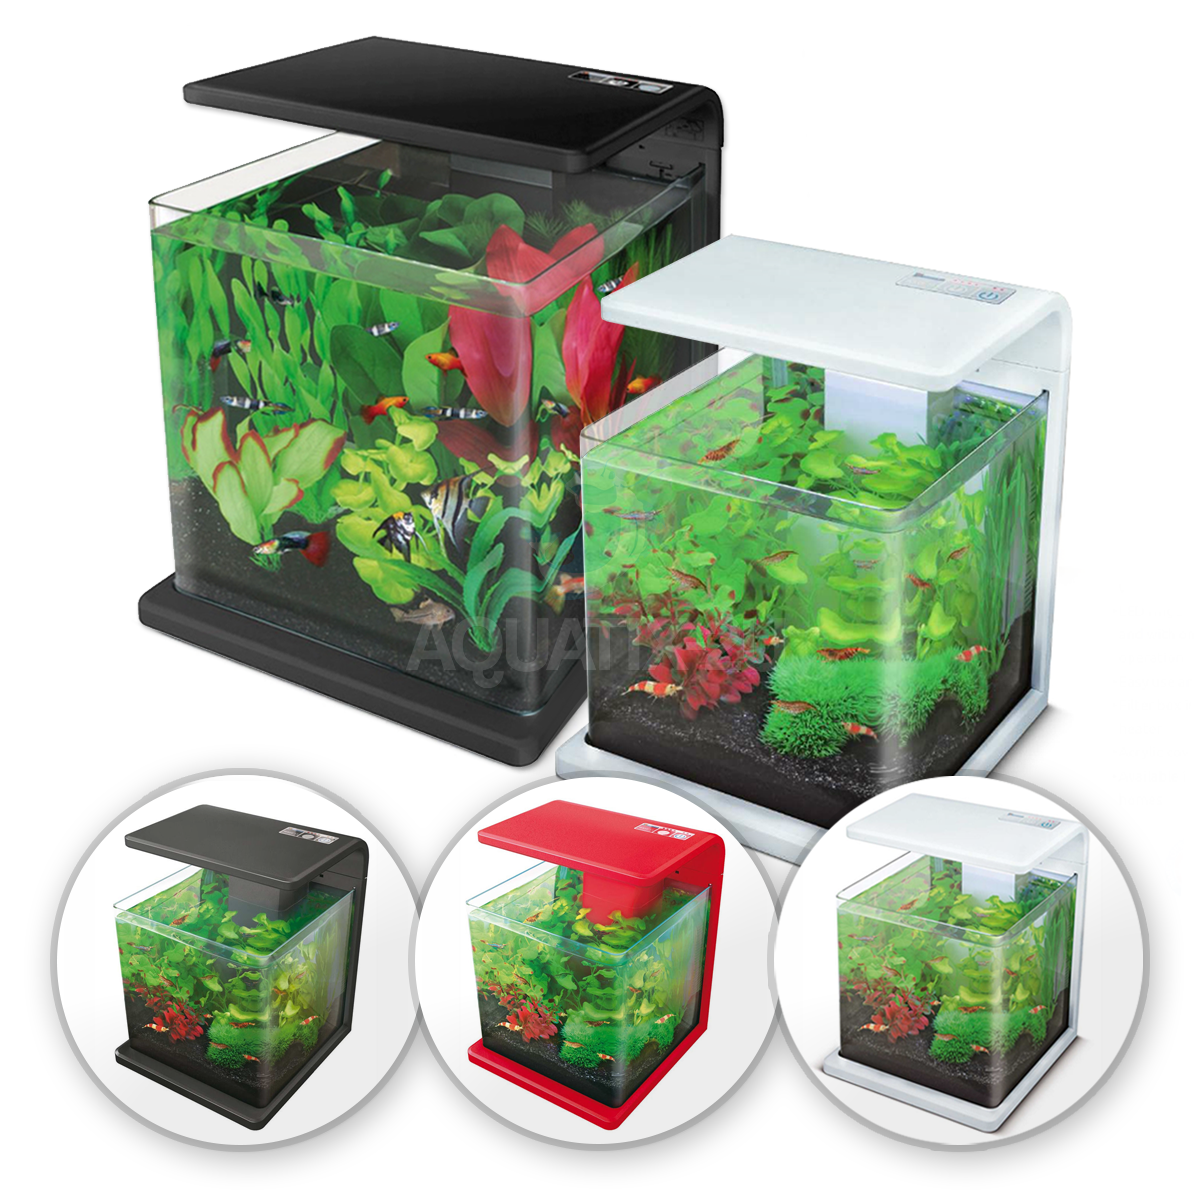 Superfish aquarium fish tank aqua 60 - Superfish Wave Aquarium 15l 30l Glass Fish Tank Complete With Lights And Filter